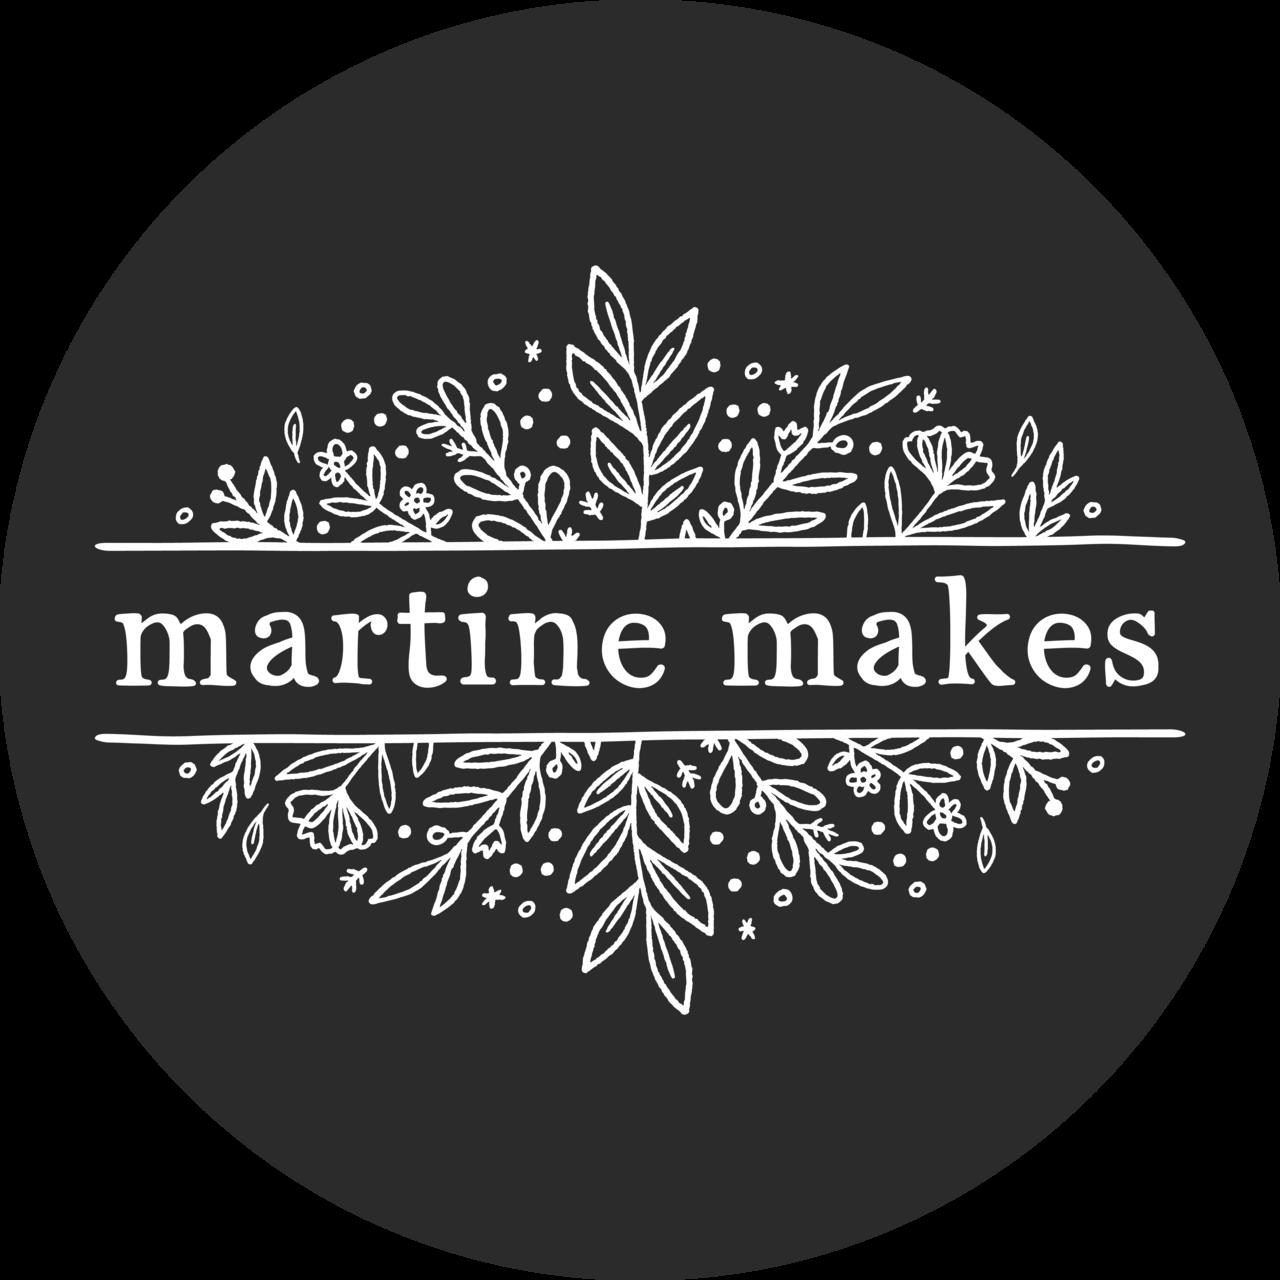 Martine Makes